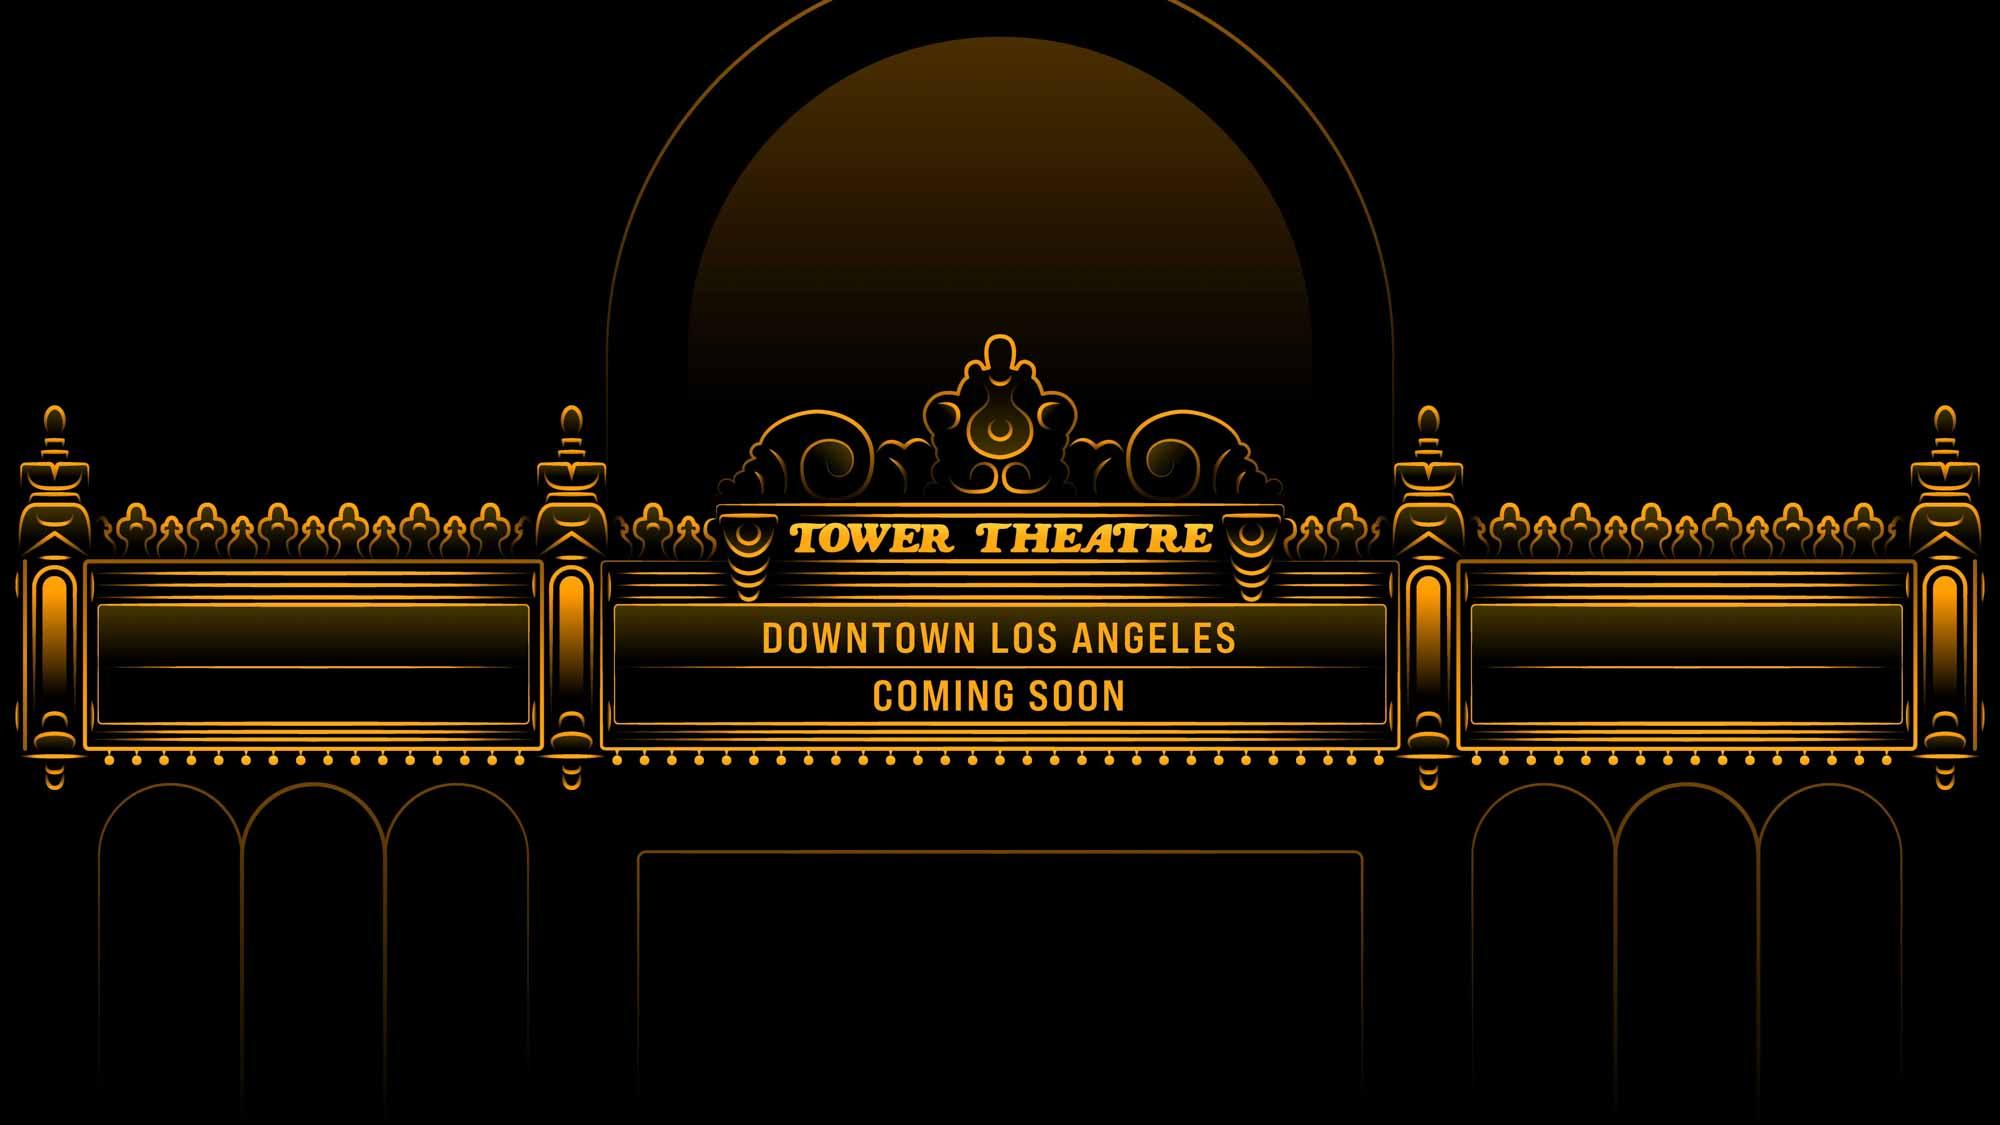 "Шатер театра Apple Tower с текстом ""Центр Лос-Анджелеса скоро будет"""